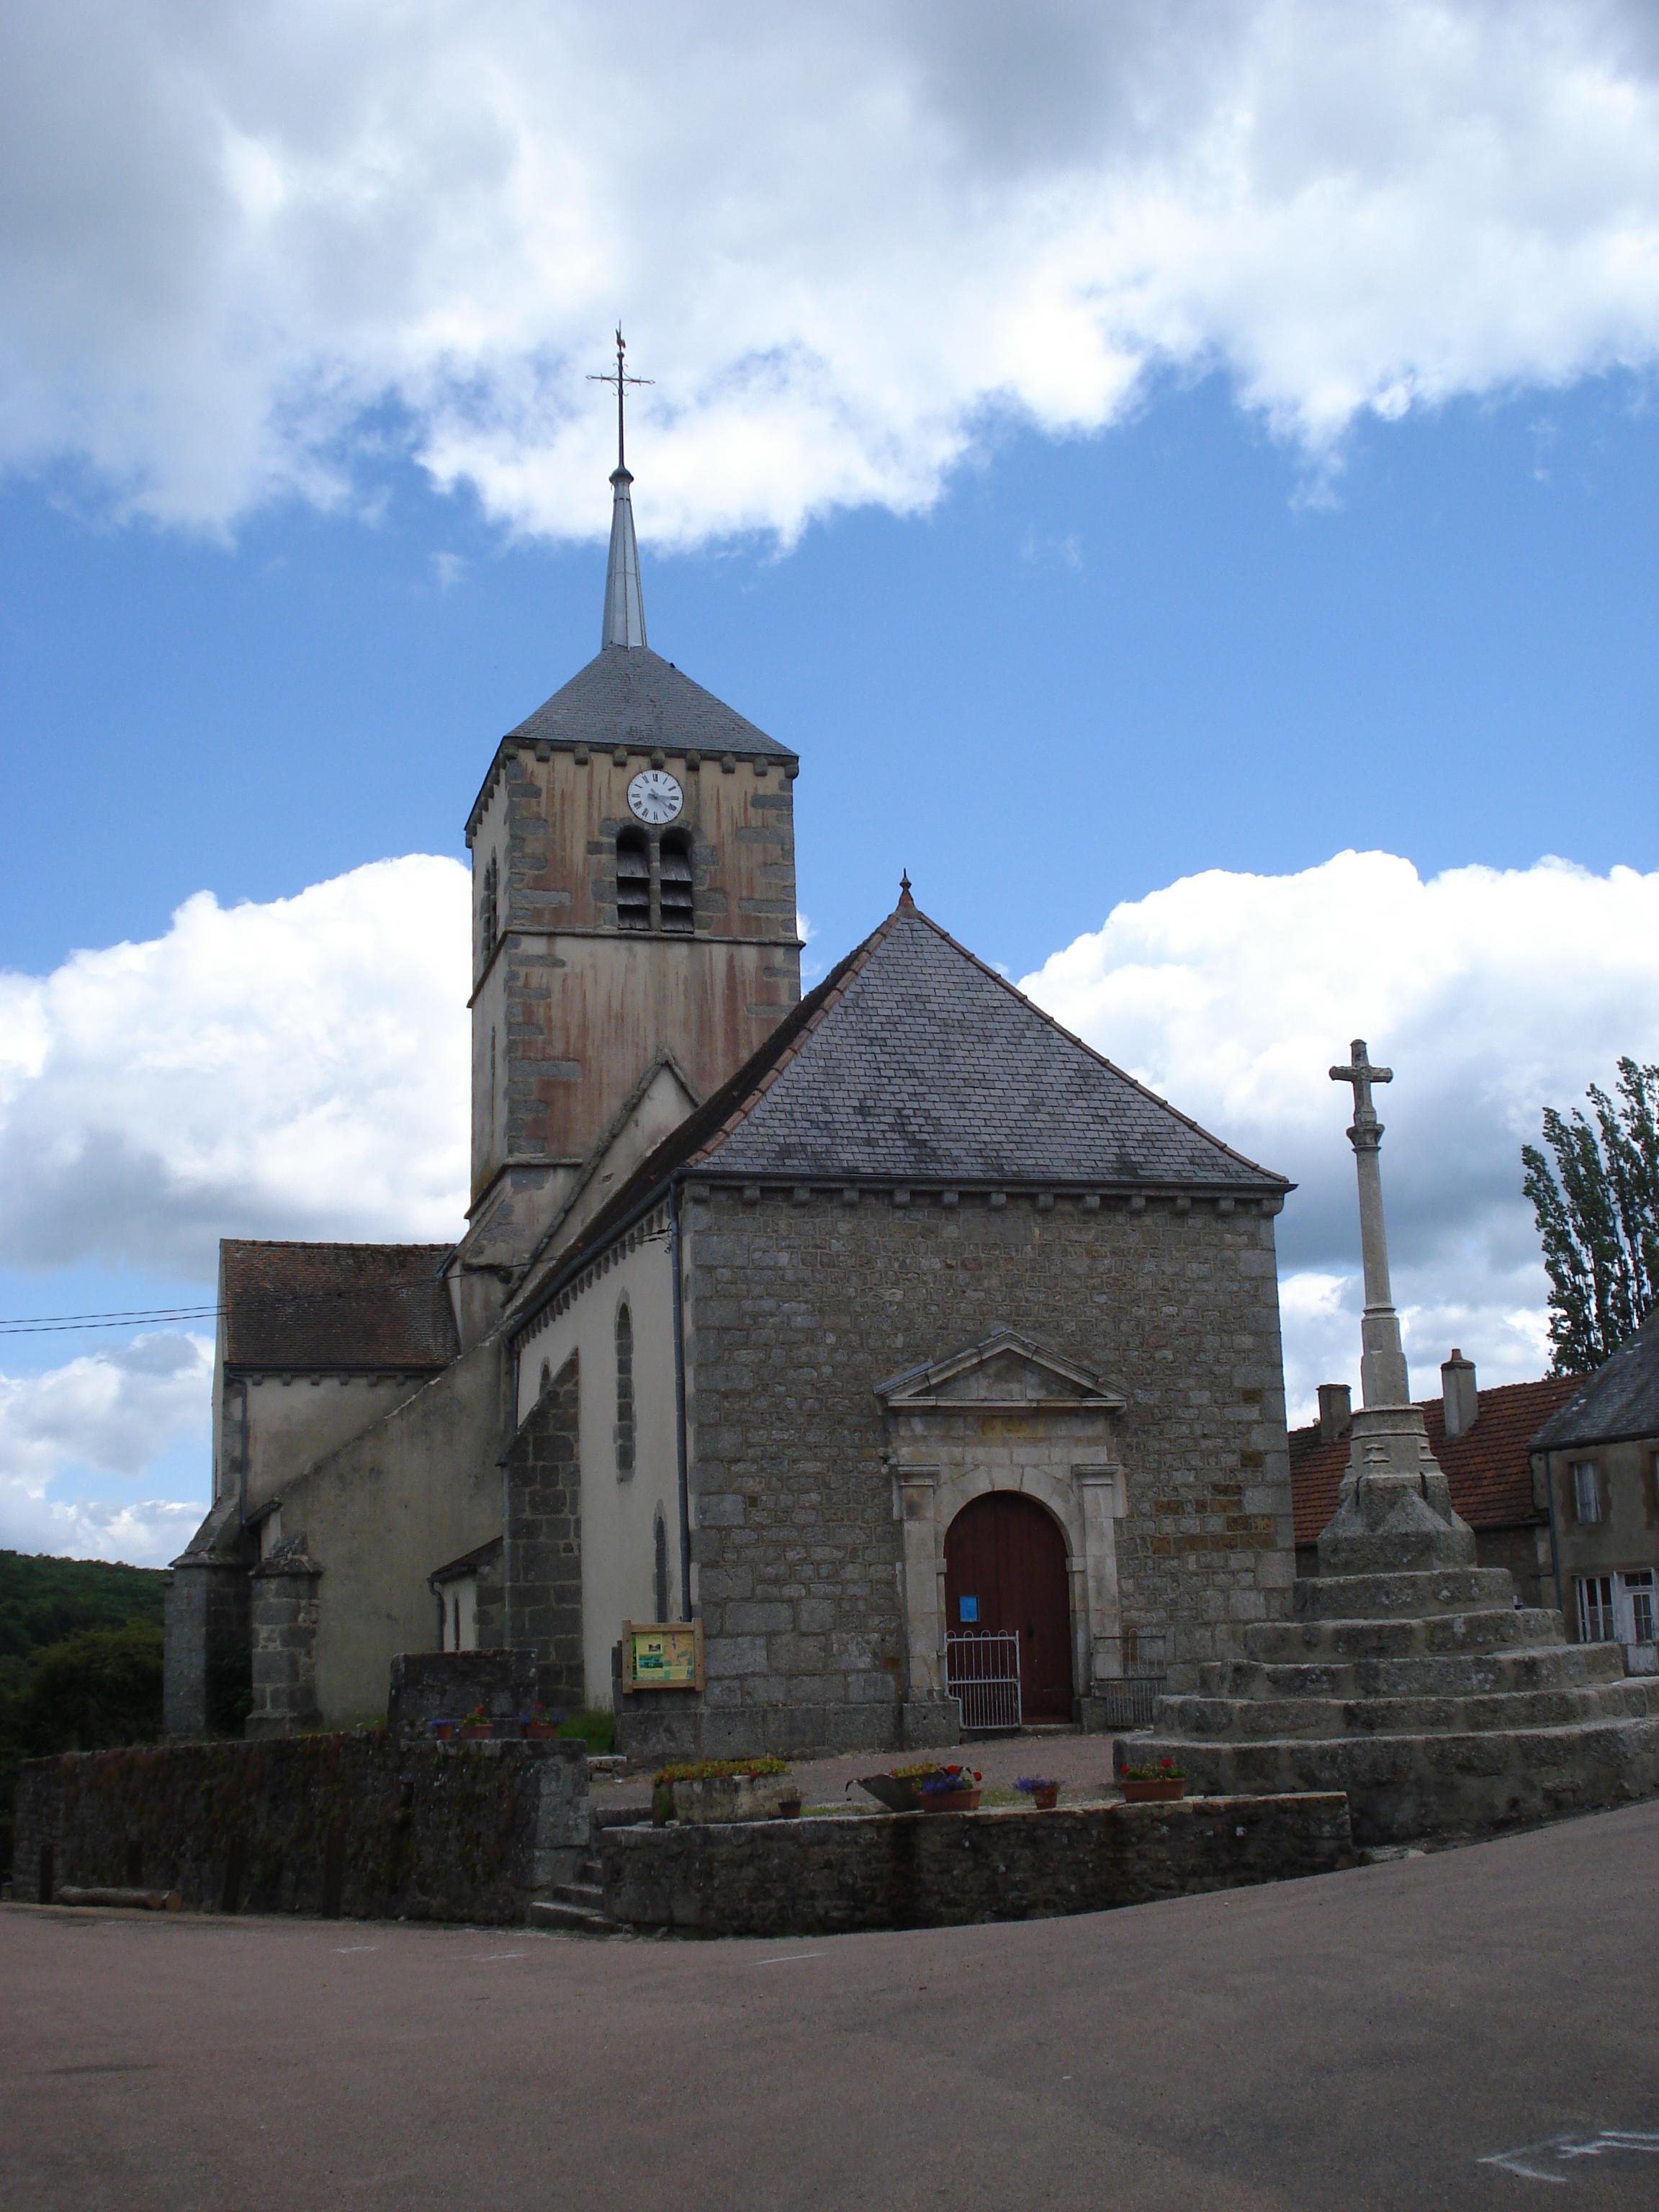 Marigny-l'Église